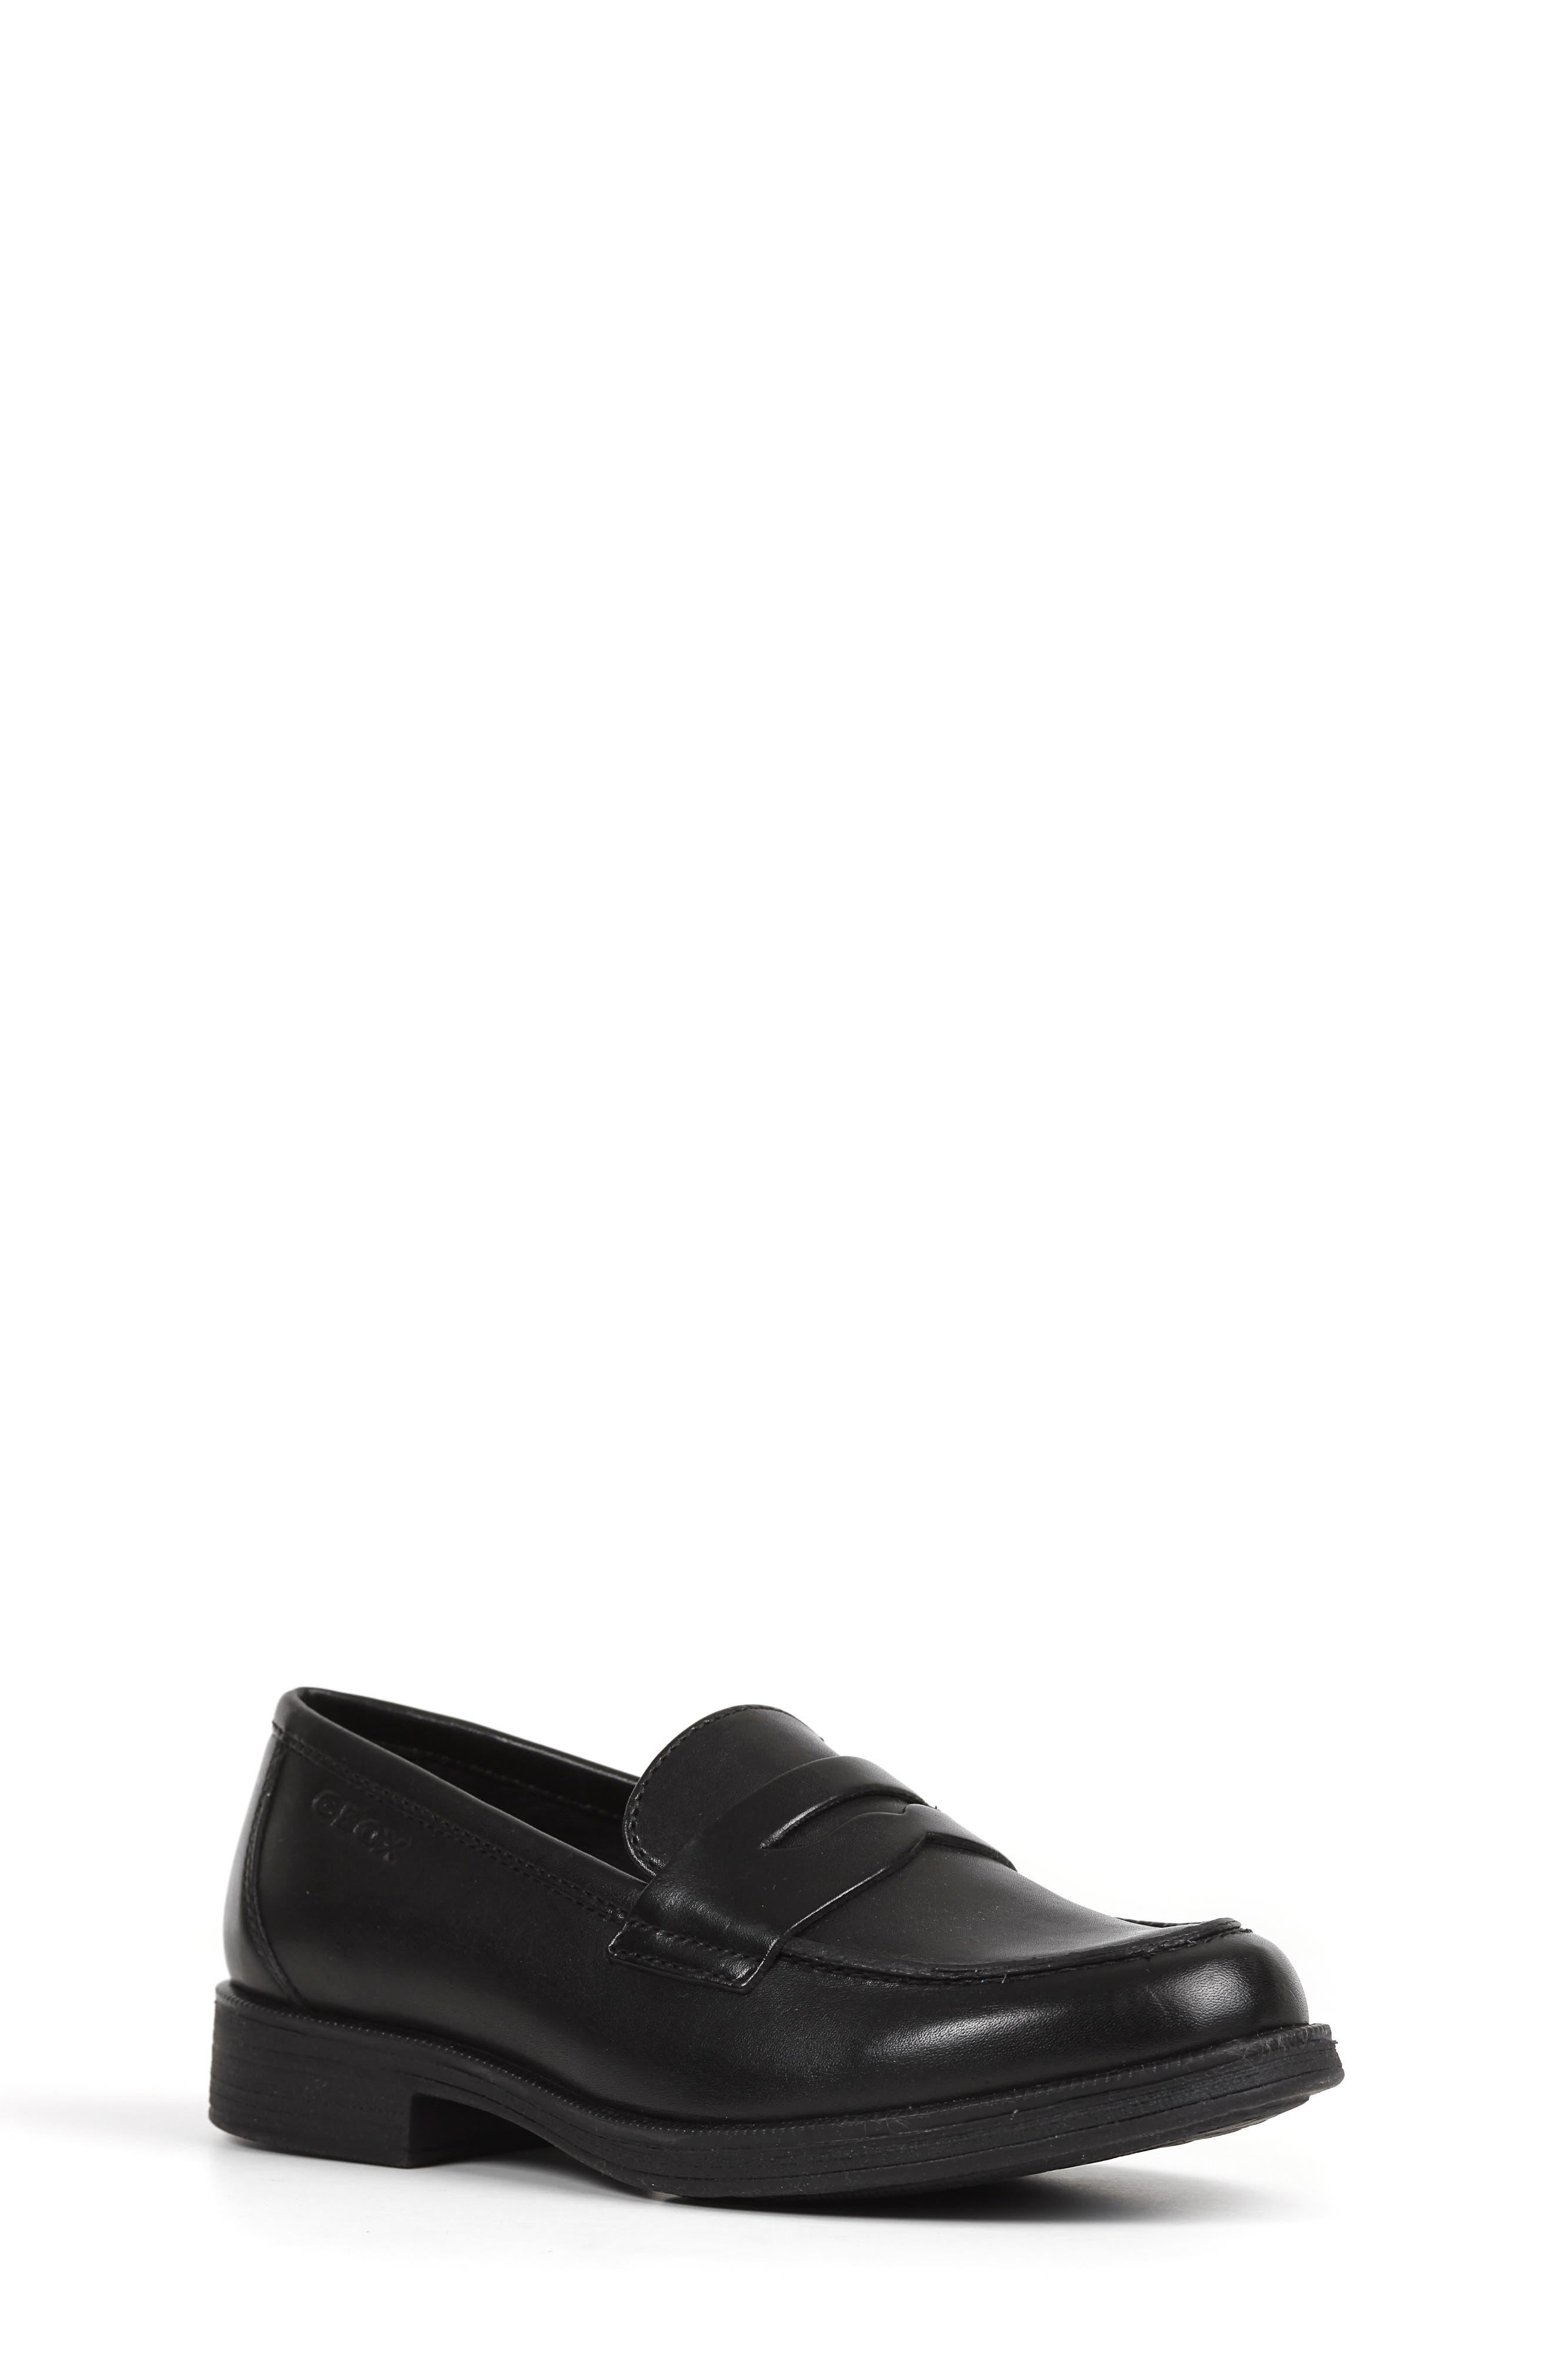 Agata 1 Penny Loafer,                         Main,                         color, BLACK